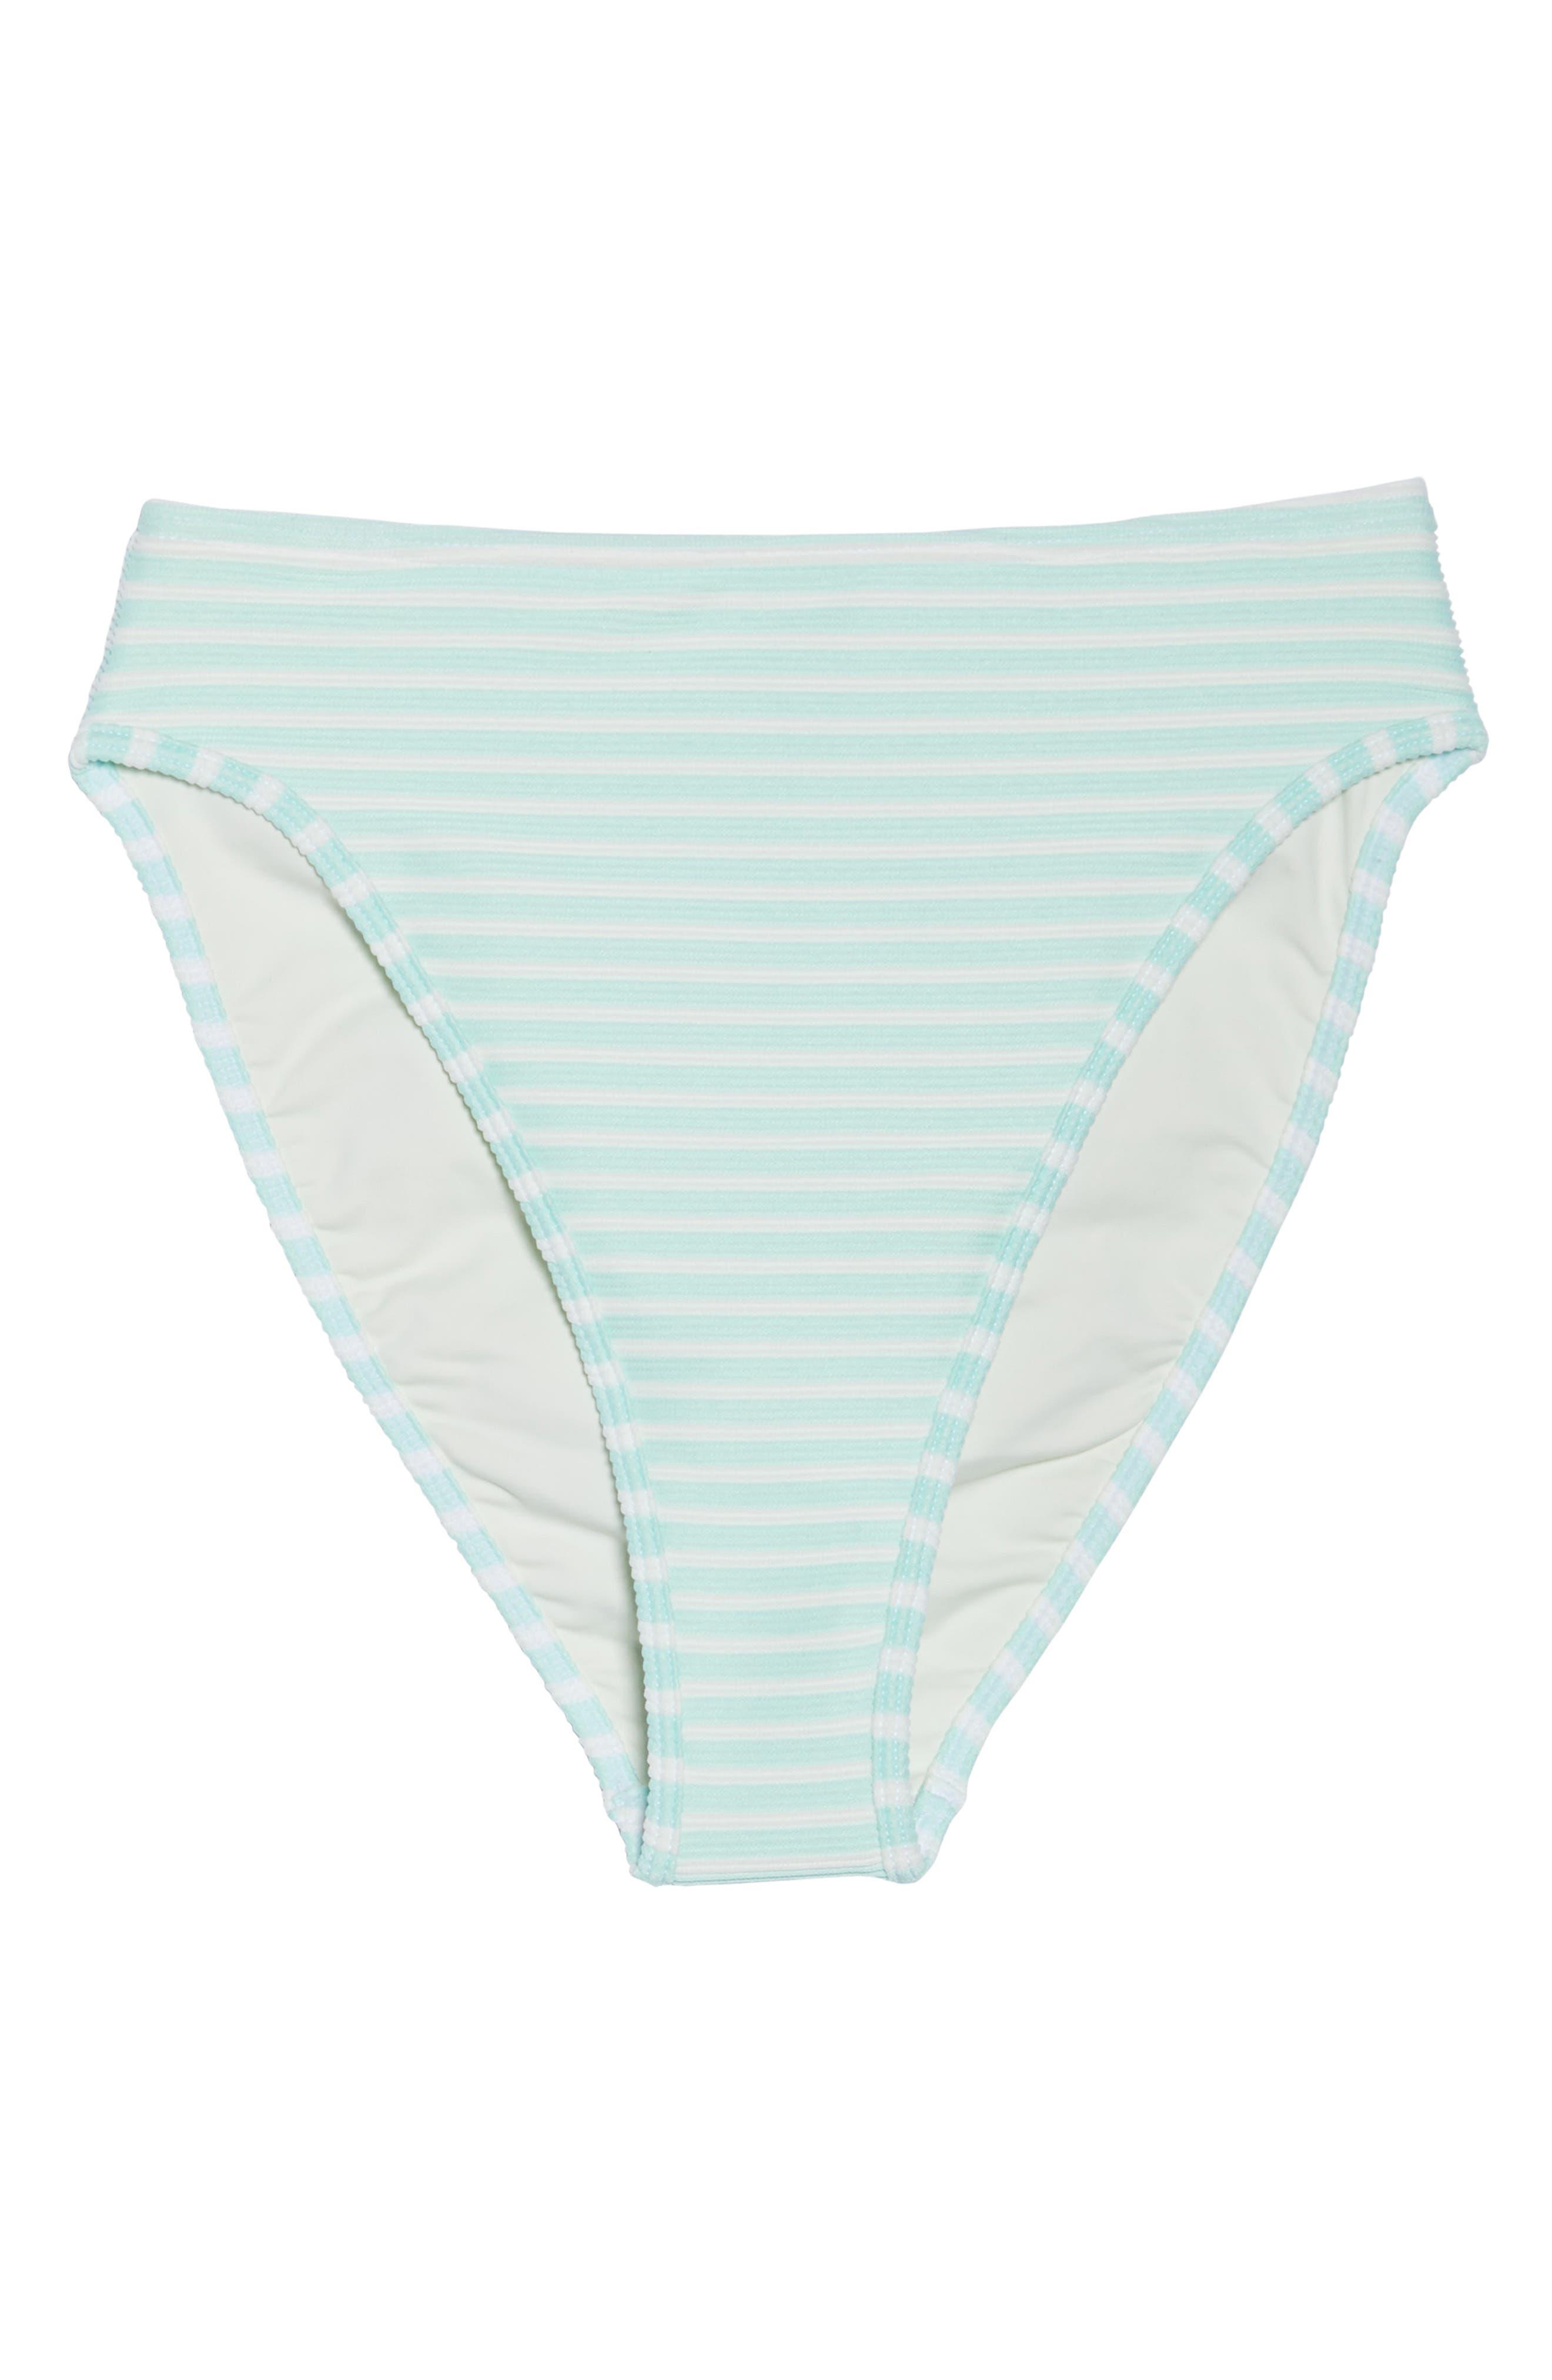 Pierre High Waist Bikini Bottoms,                             Alternate thumbnail 9, color,                             Spearmint